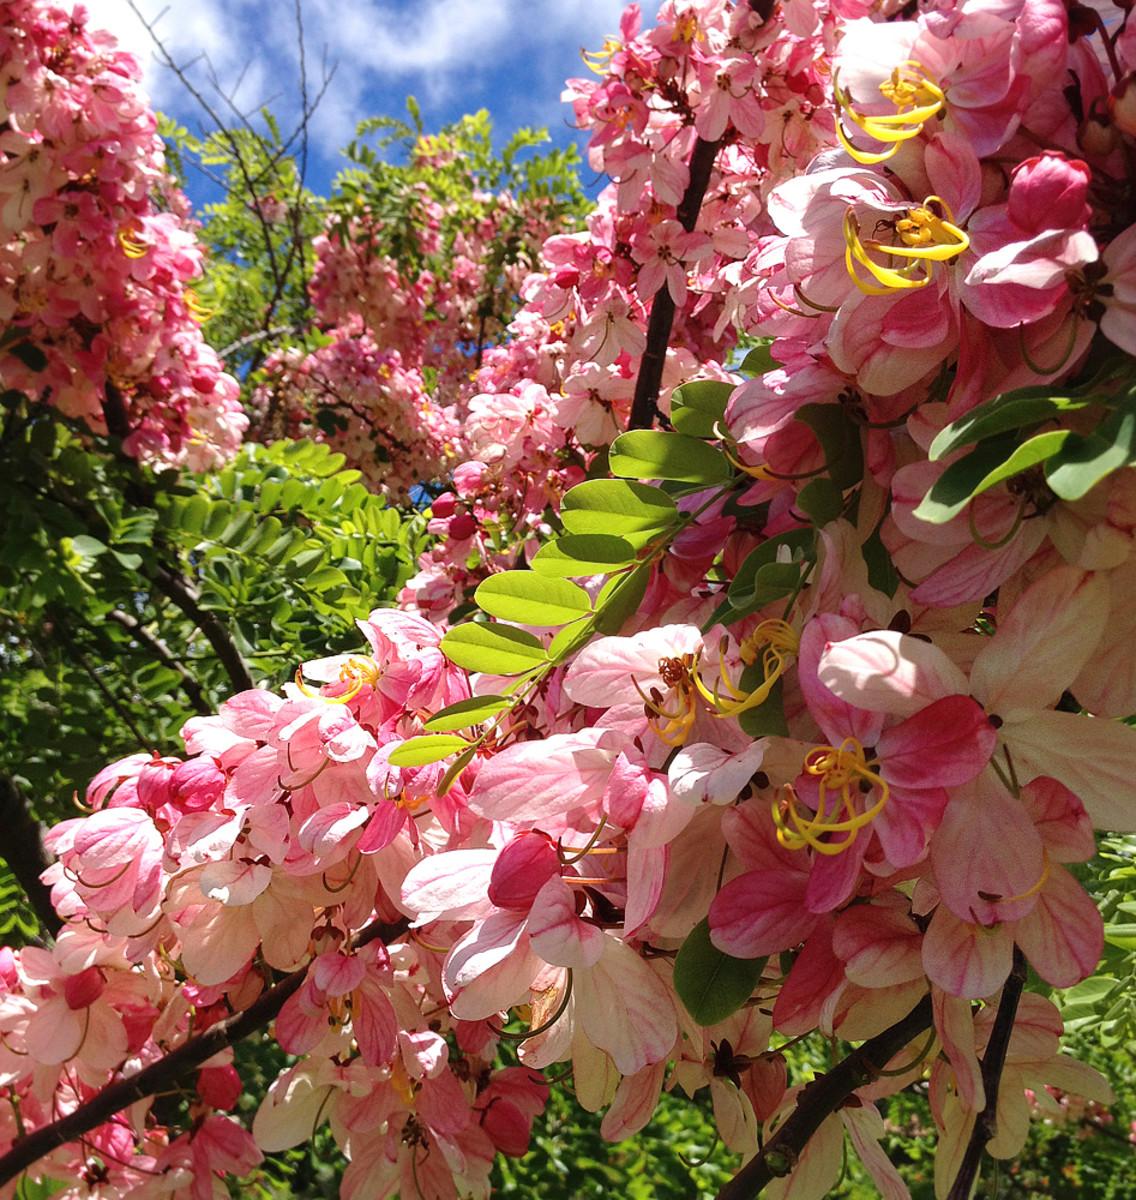 Pink Rainbow Shower Tree in full bloom.